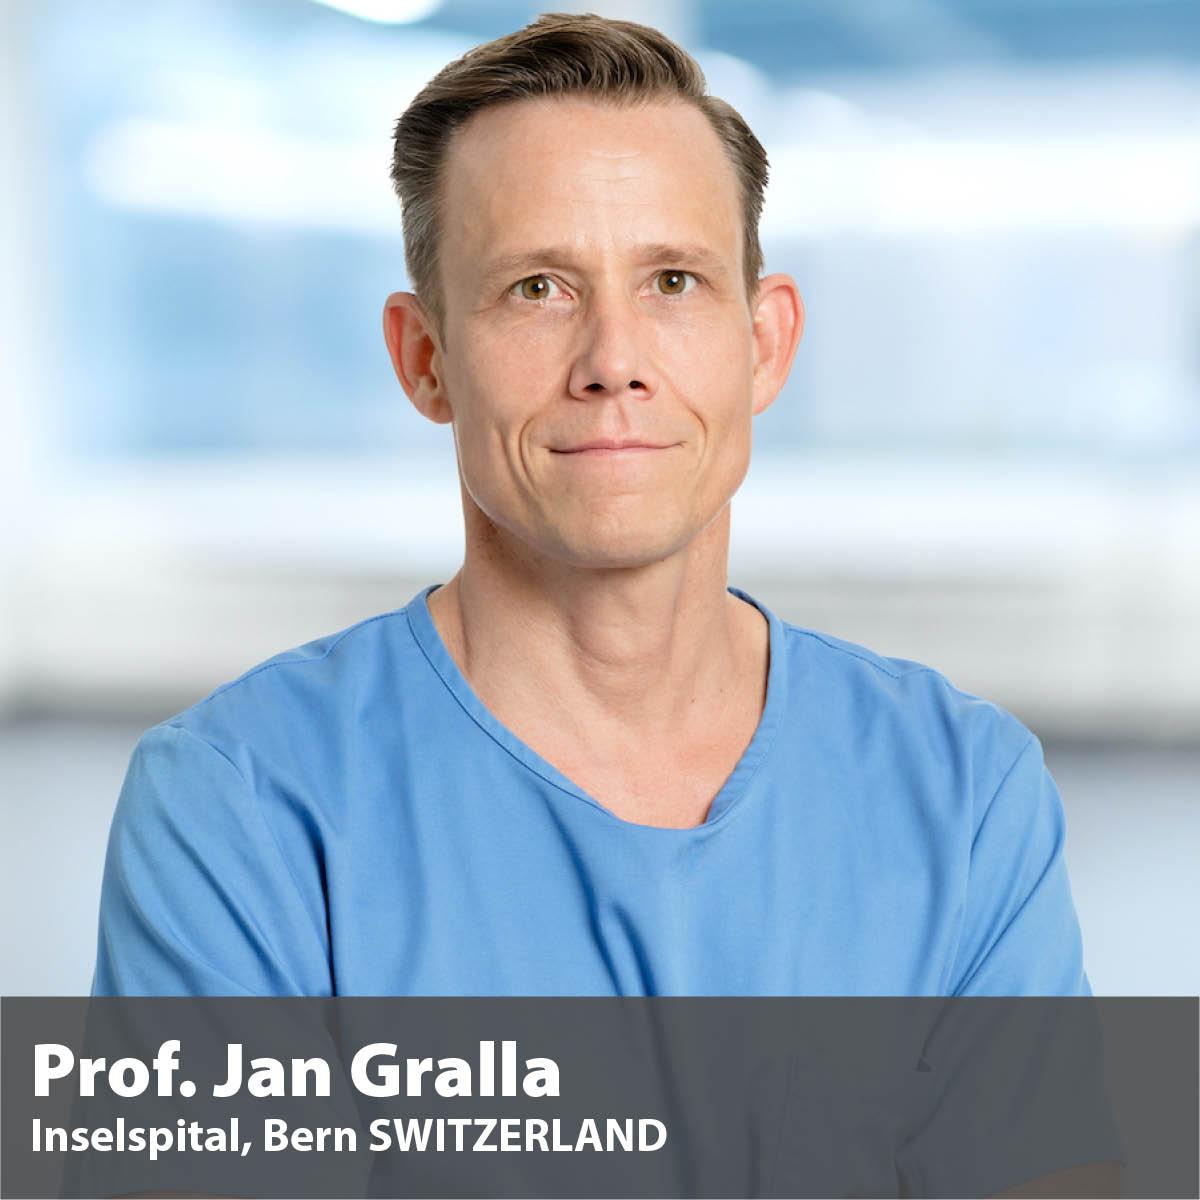 Mentor Prof. Jan Gralla Bern Switzerland